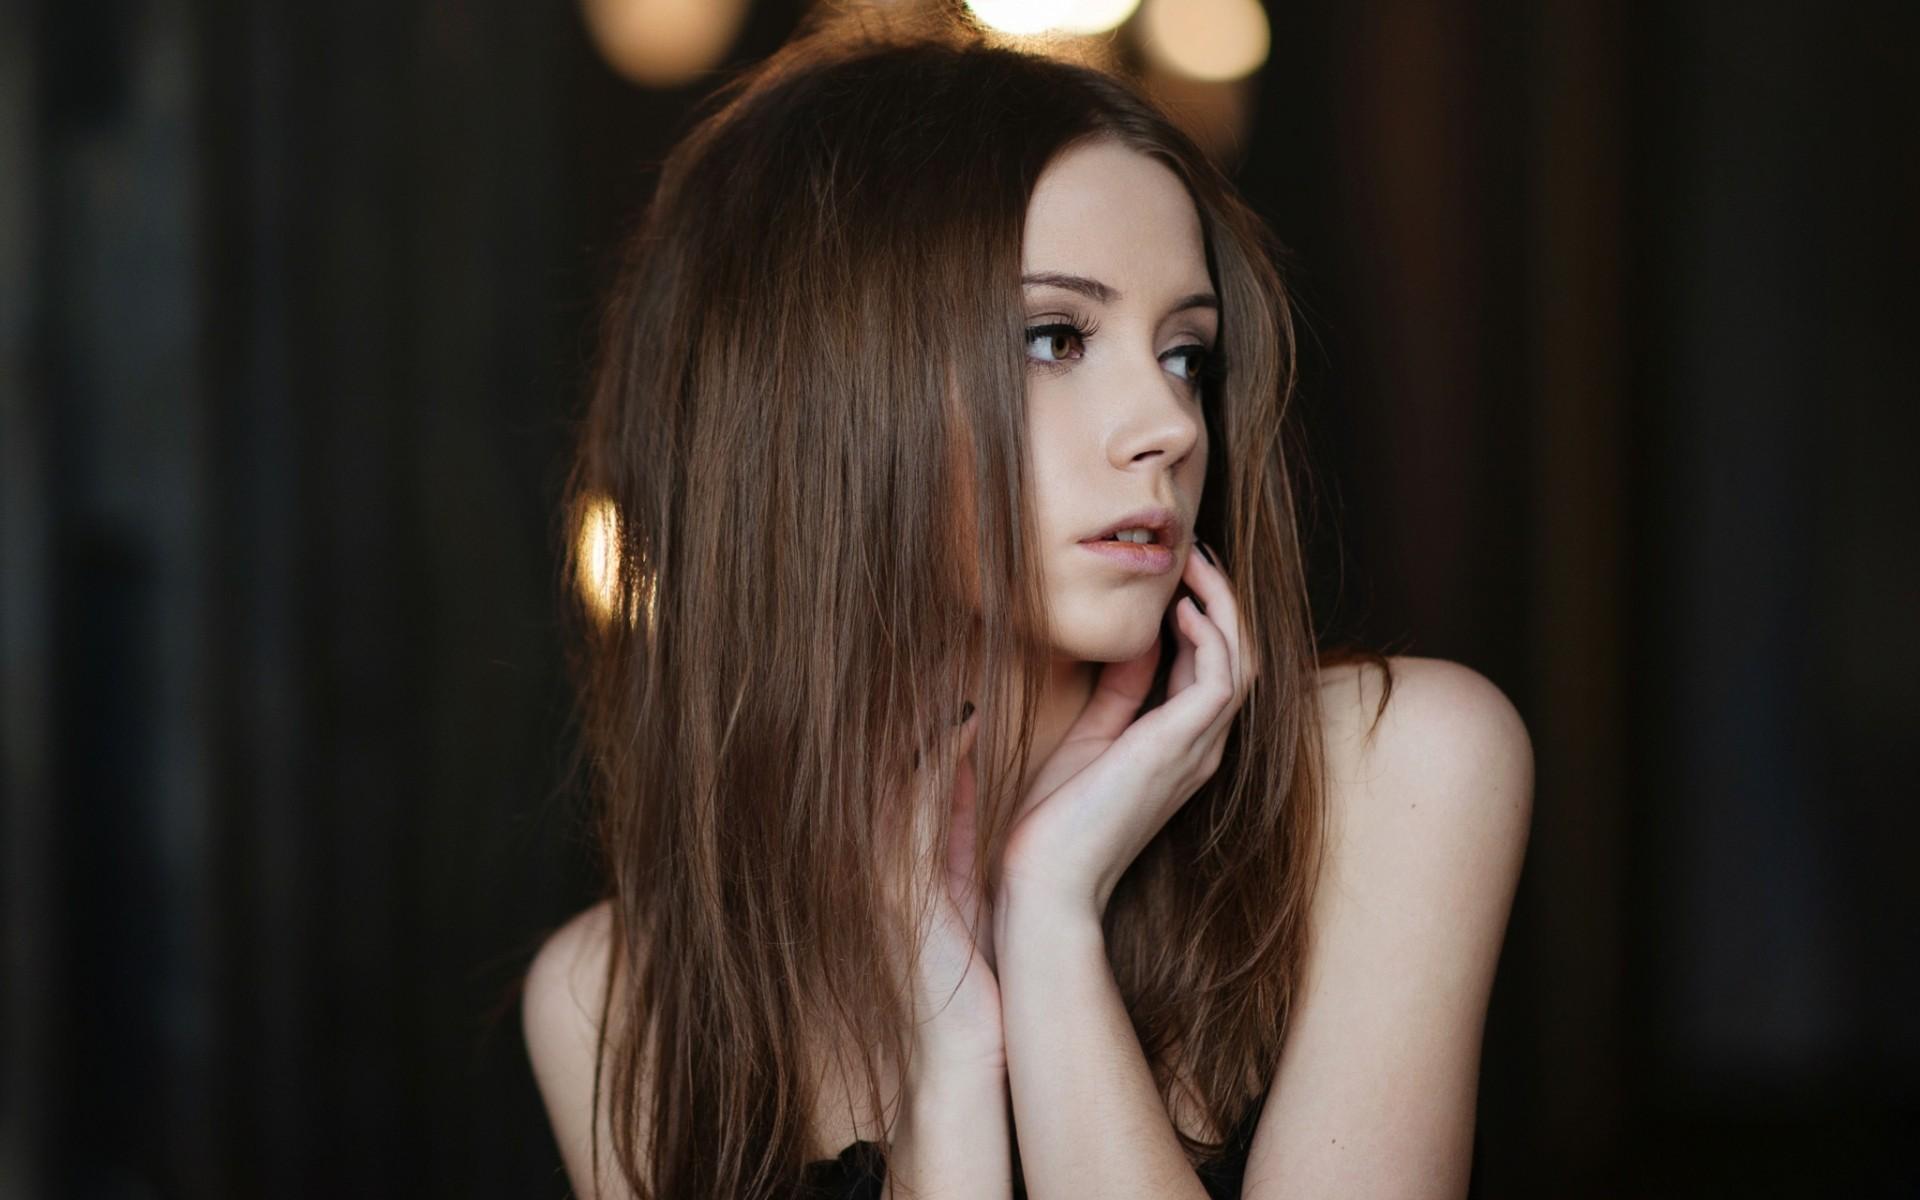 Xenia Kokoreva